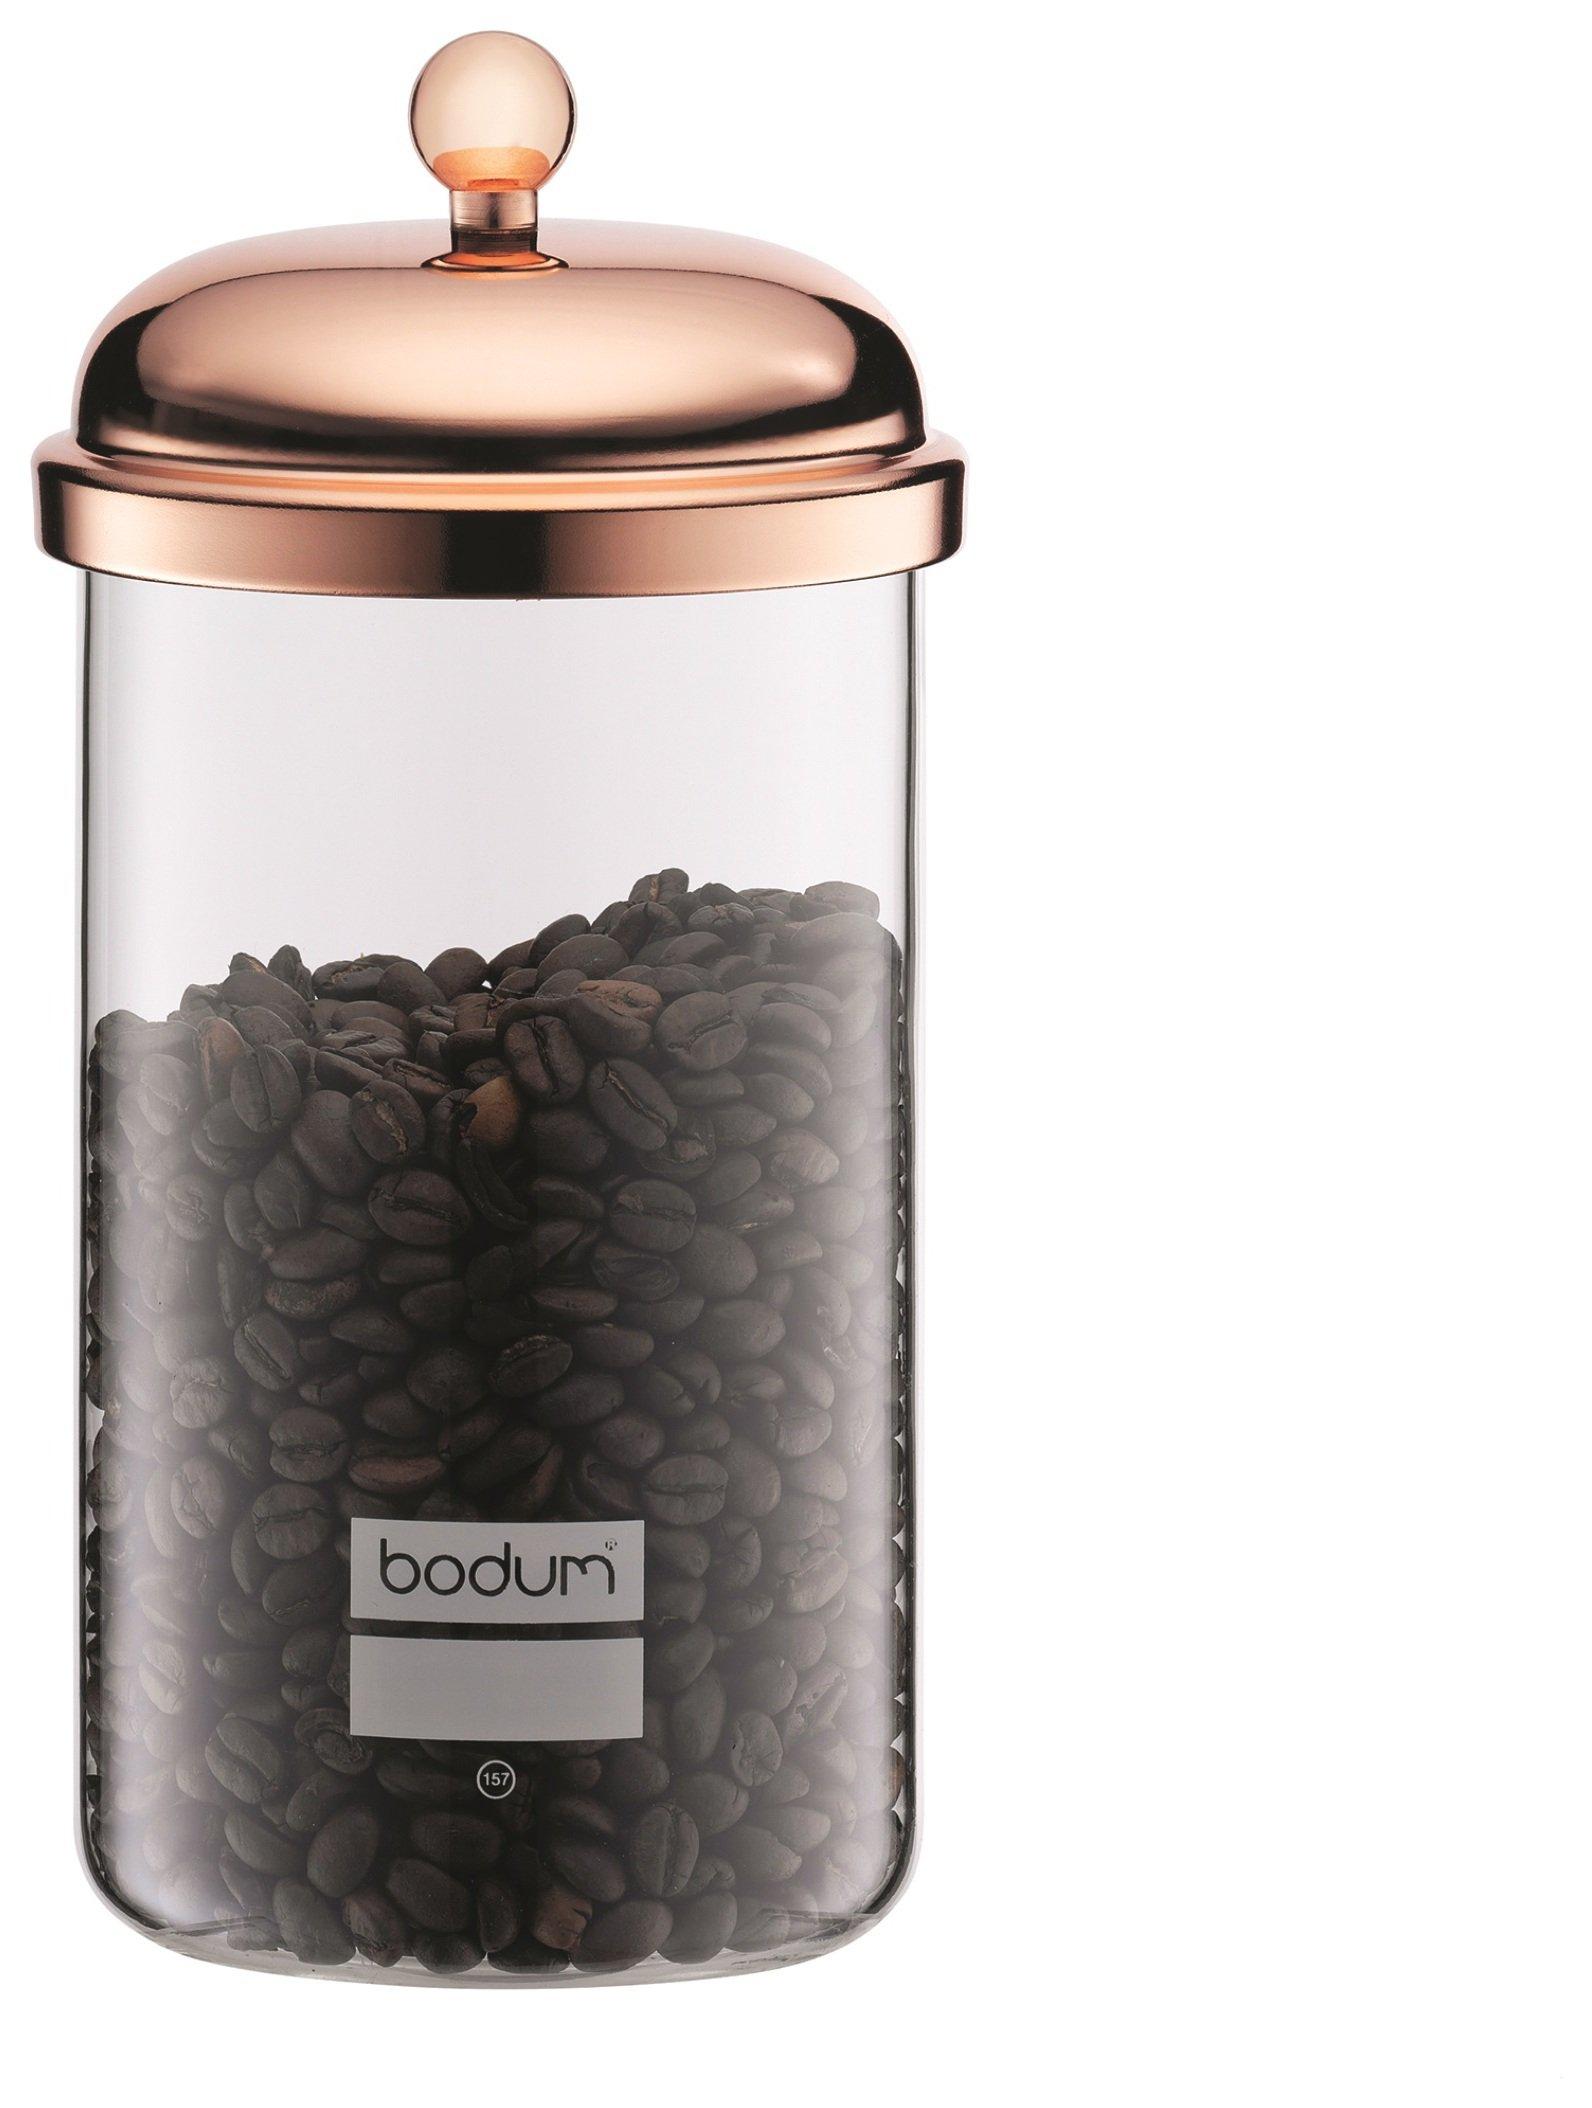 Bodum Chambord Storage Jar - Copper